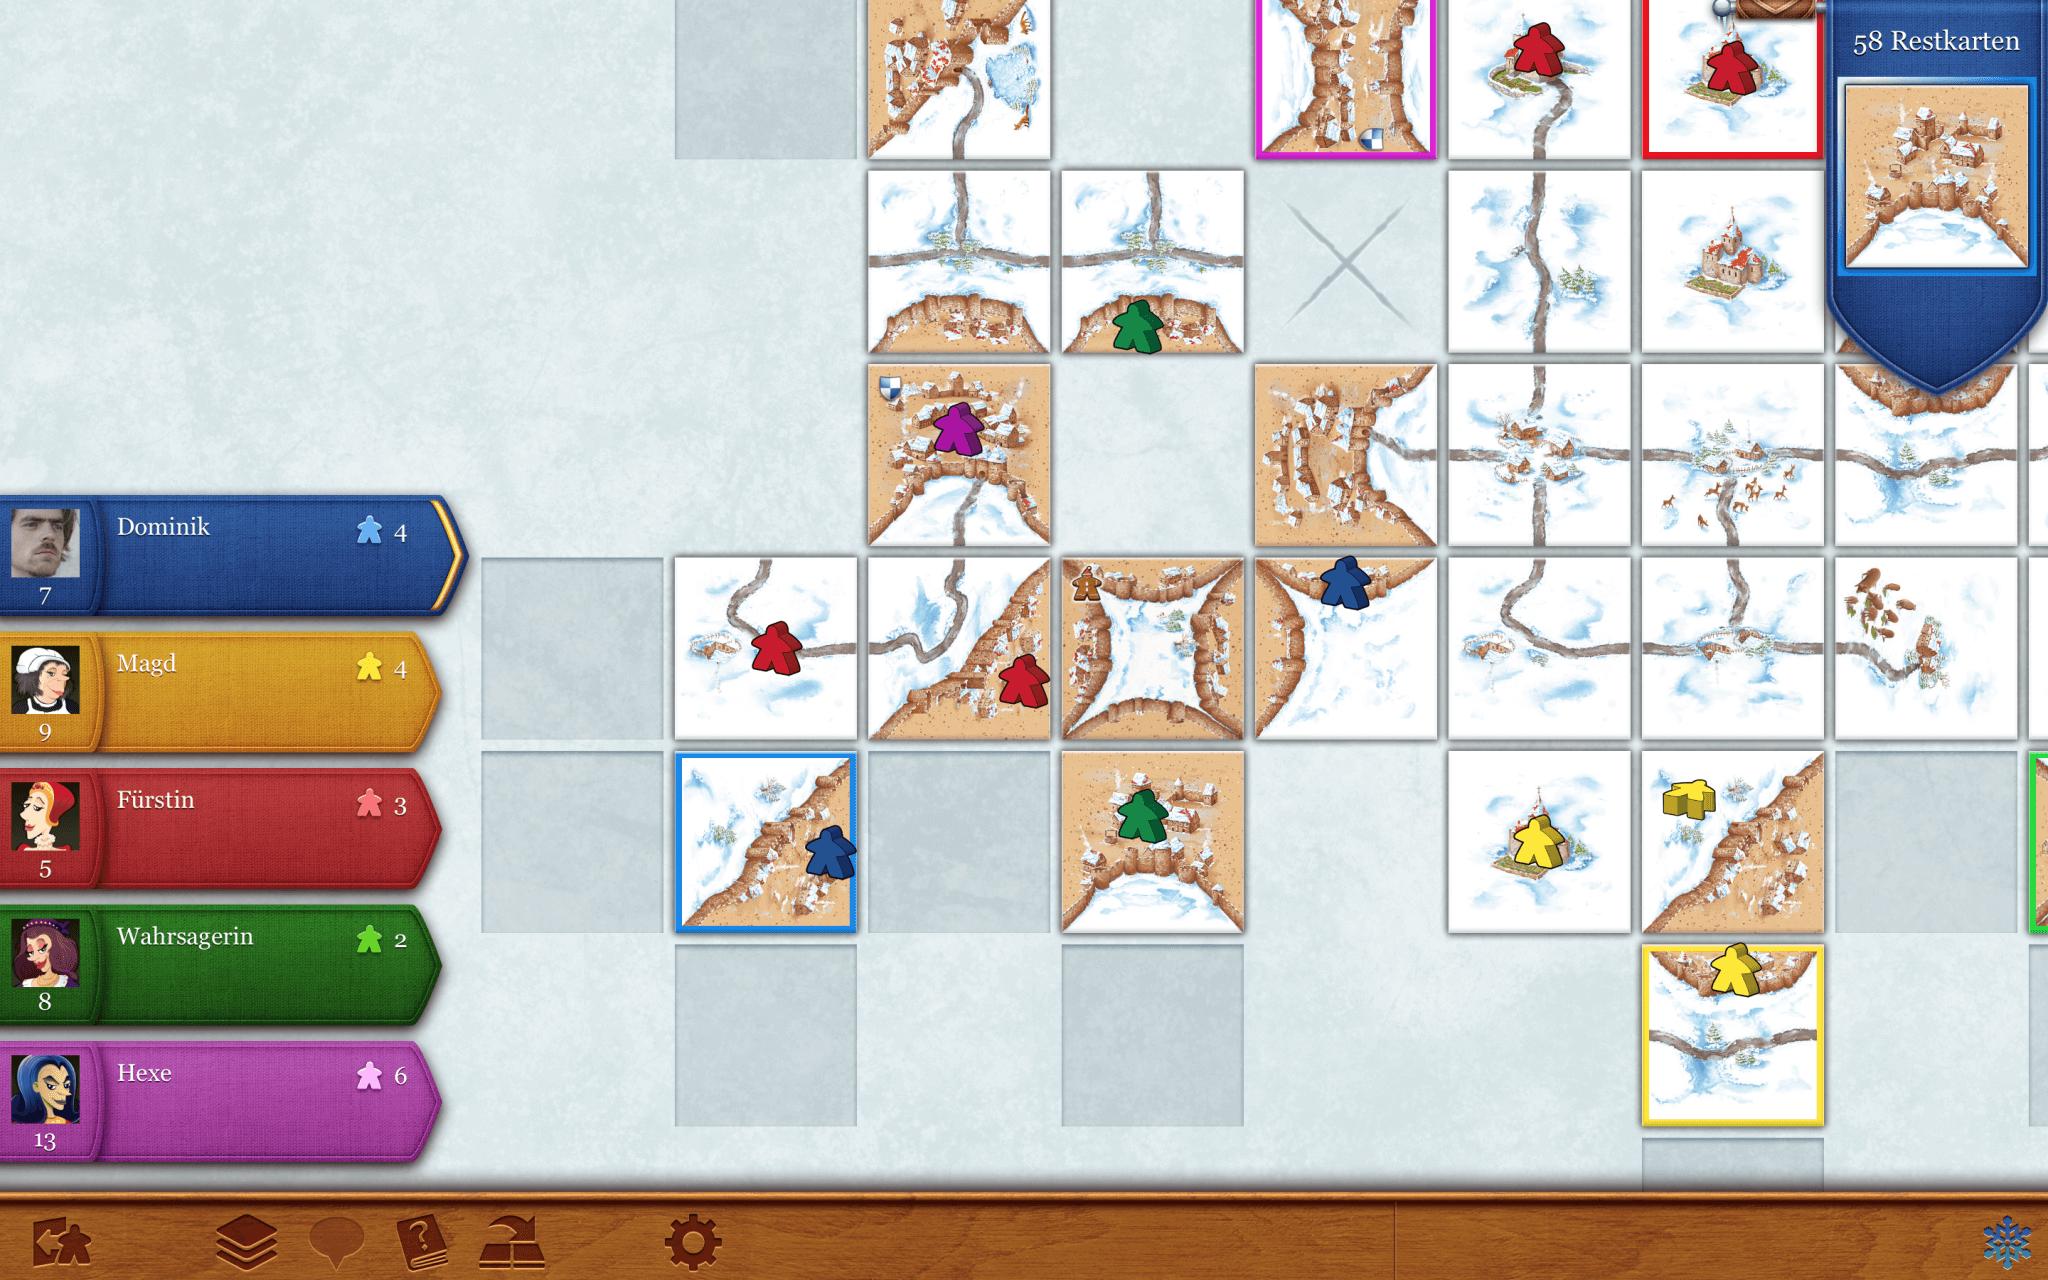 Carcassonne (Mac): Der Winter kommt (Bildrechte: Coding Monkeys)